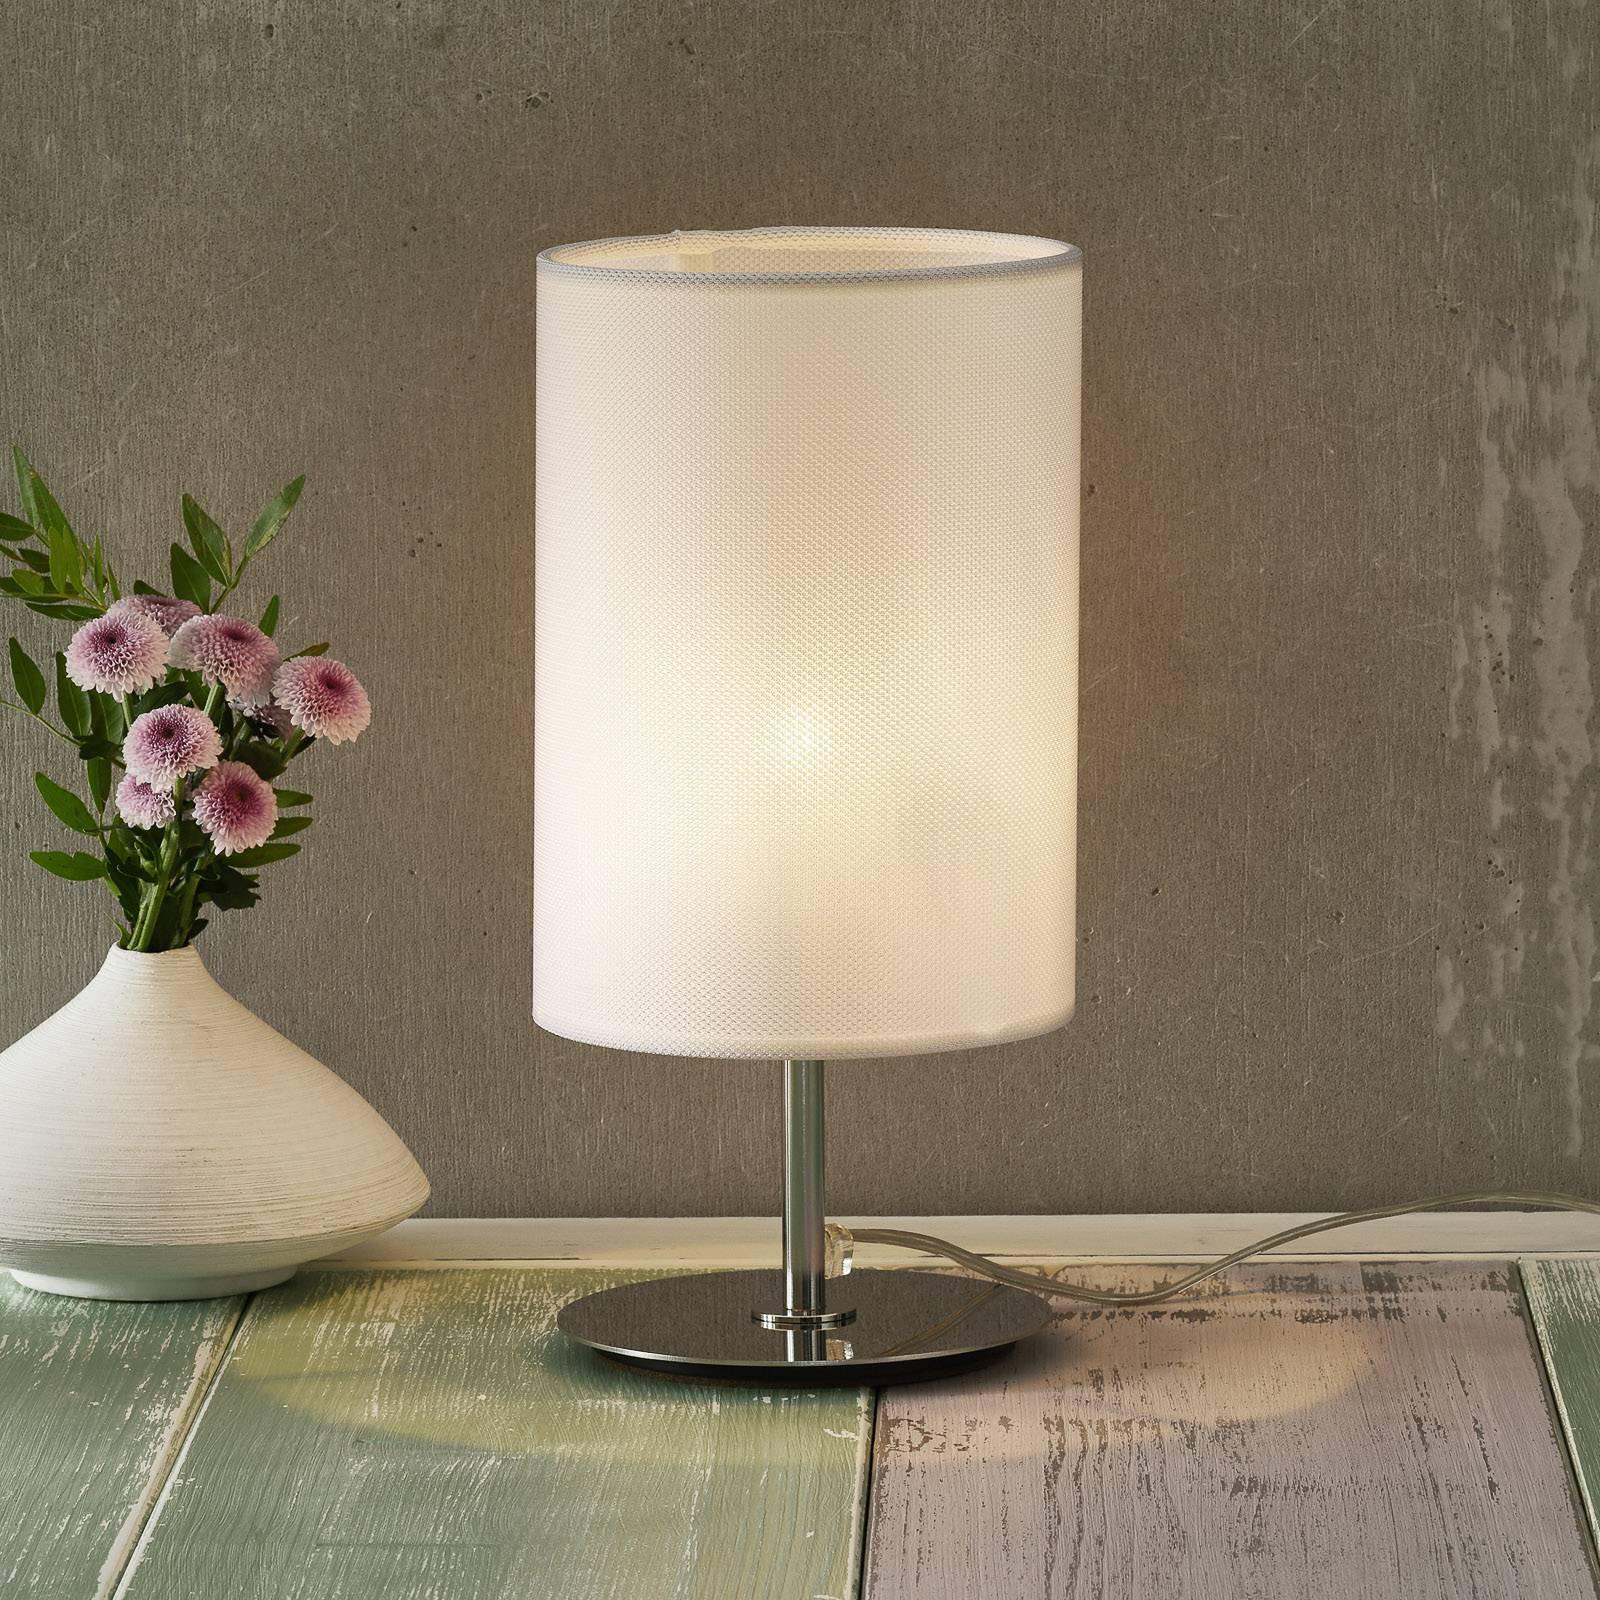 Stilo Lumetto bordlampe hvit